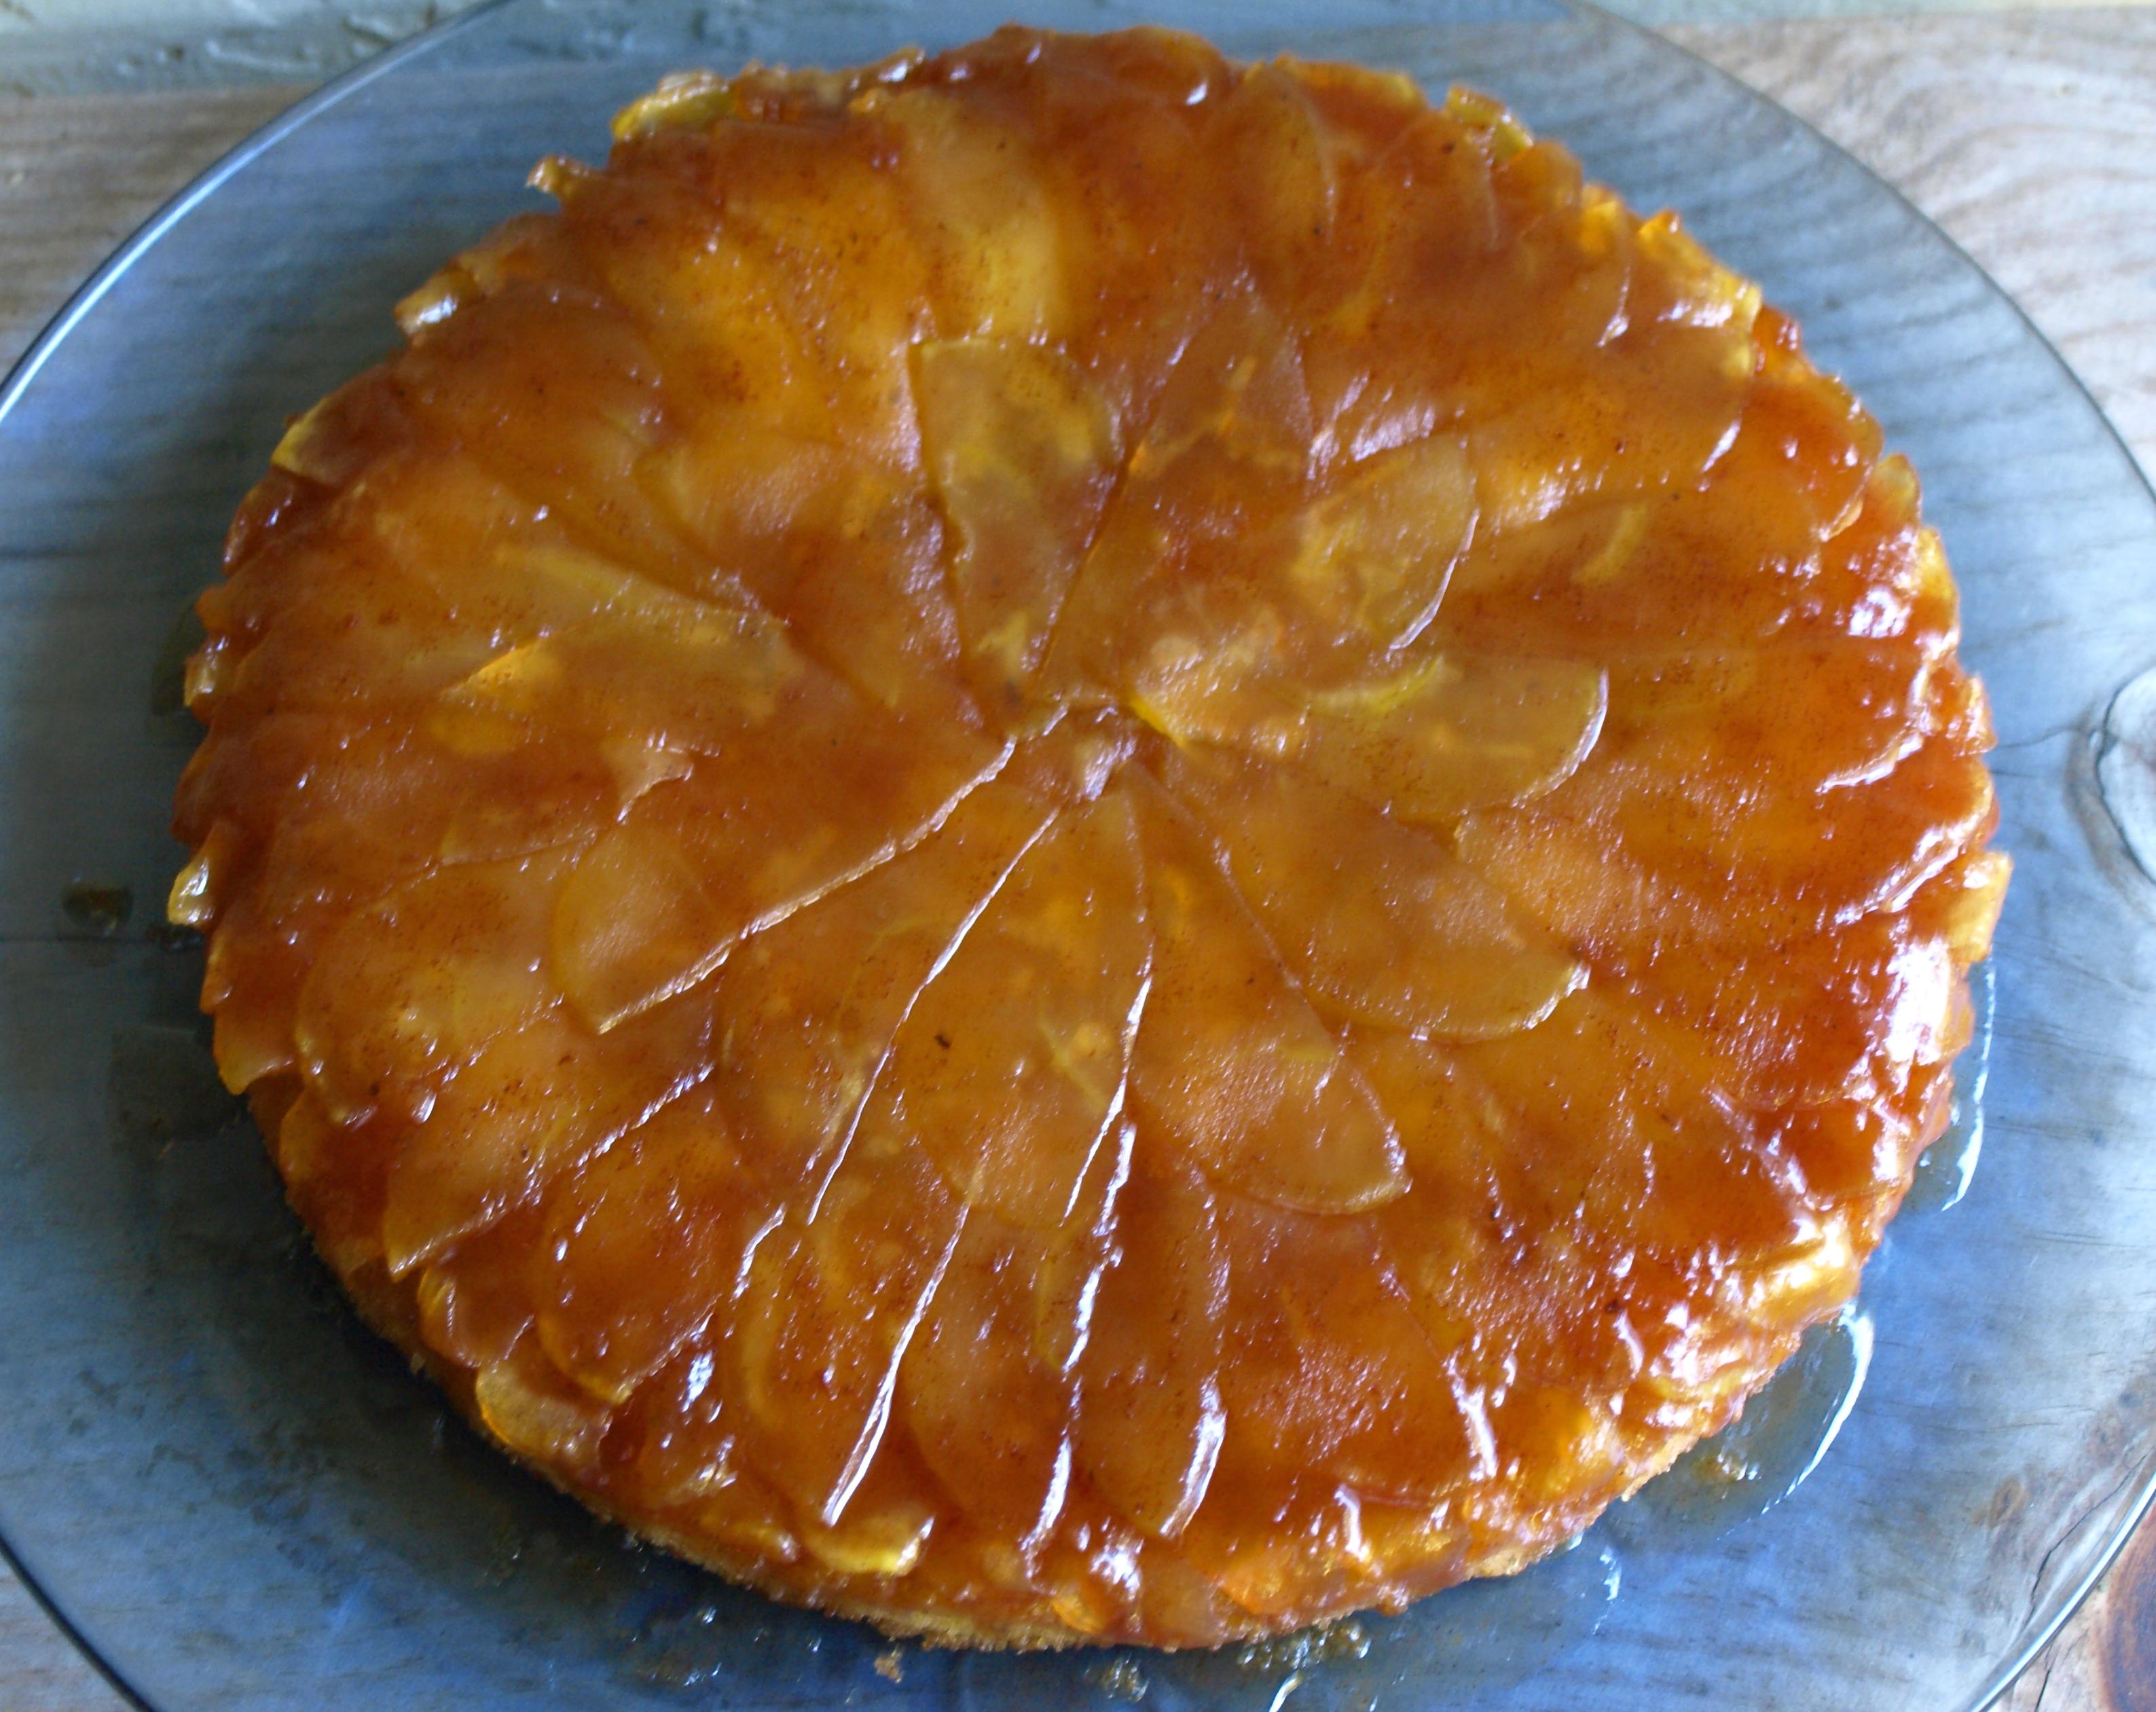 french mousse cake mom s apple cake rum apple cake apple d apple cake ...